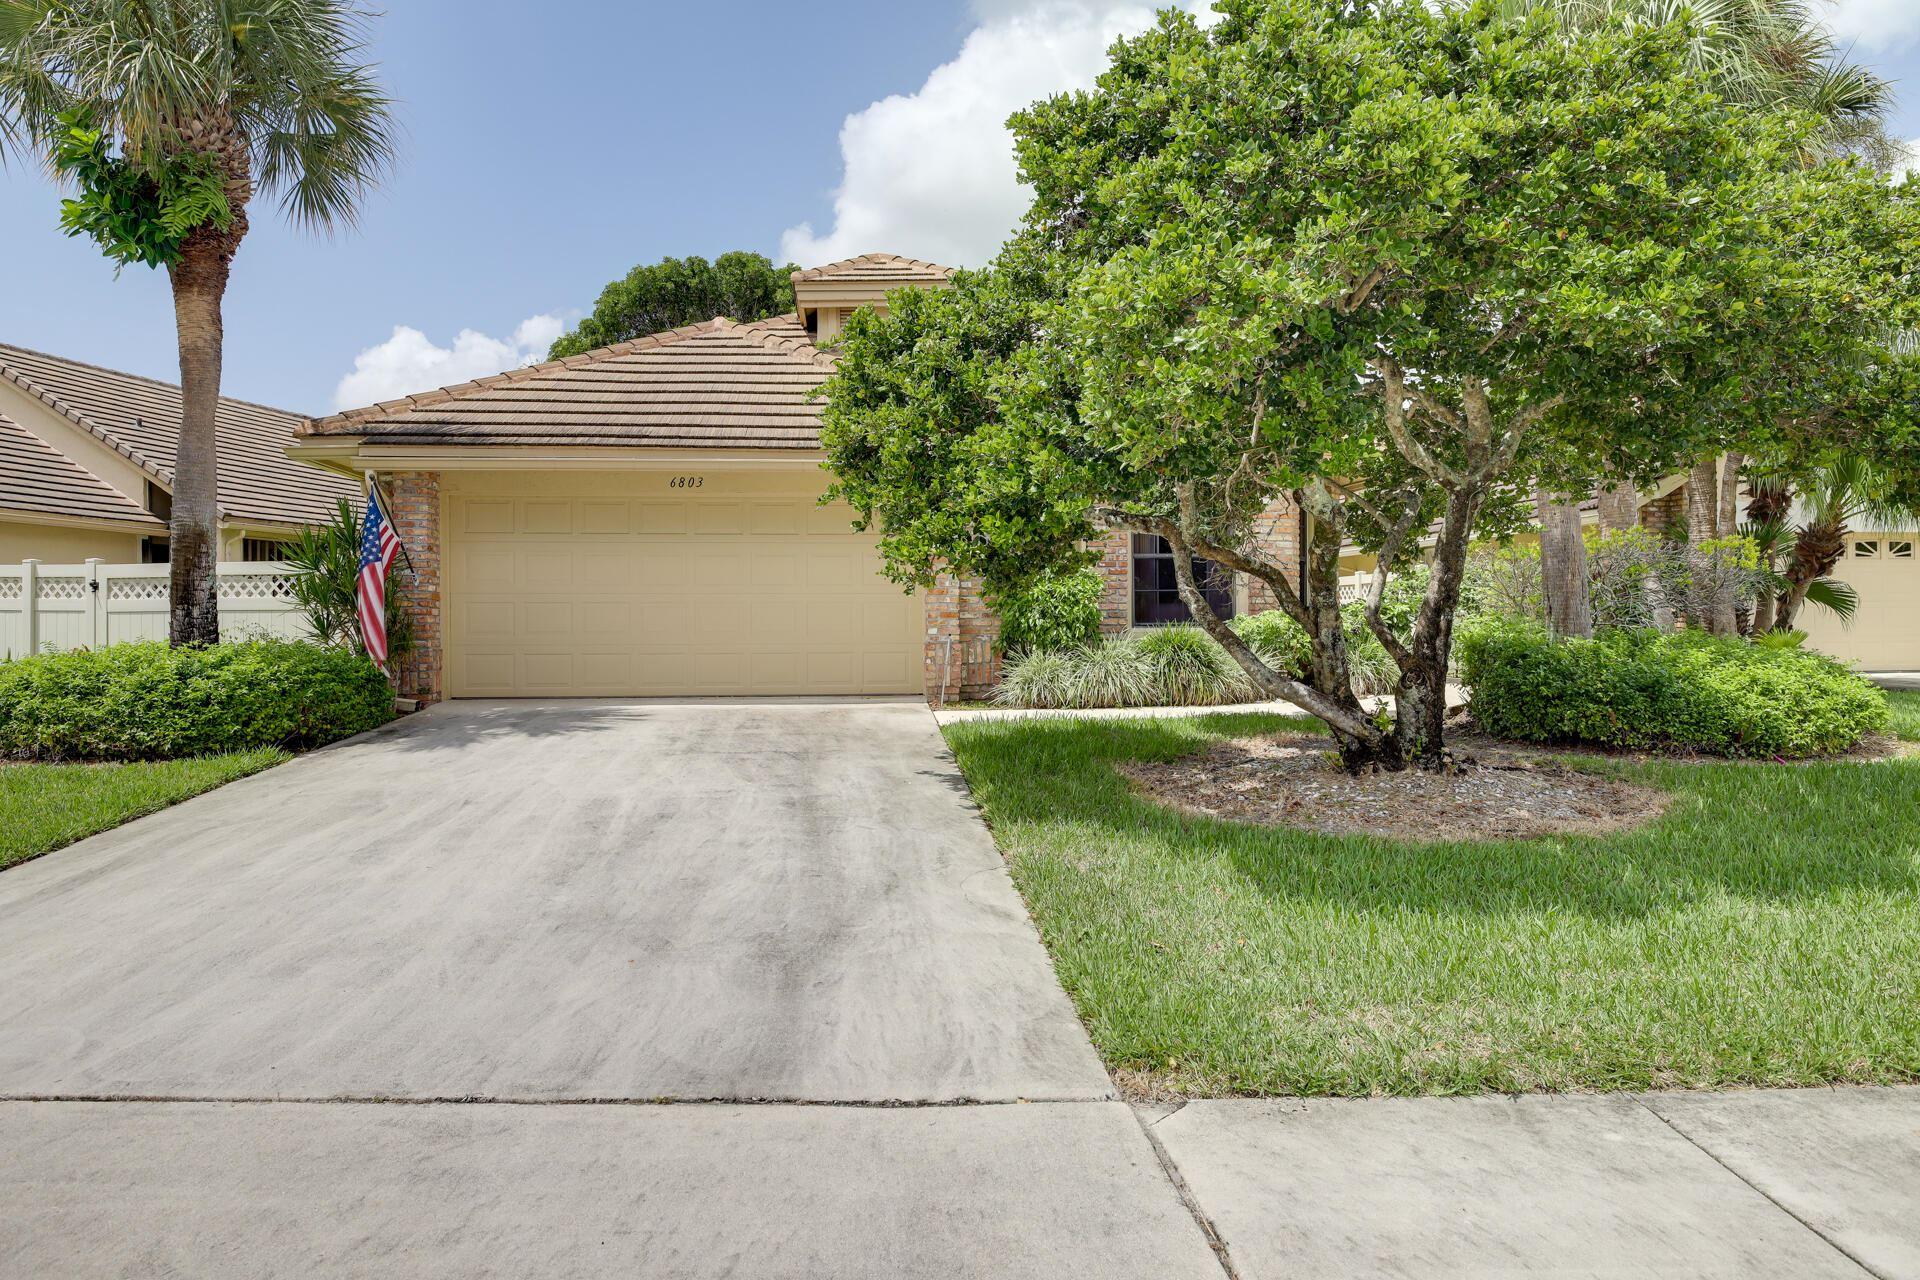 6803 Bitterbush Place, Boynton Beach, FL 33472 - #: RX-10744224